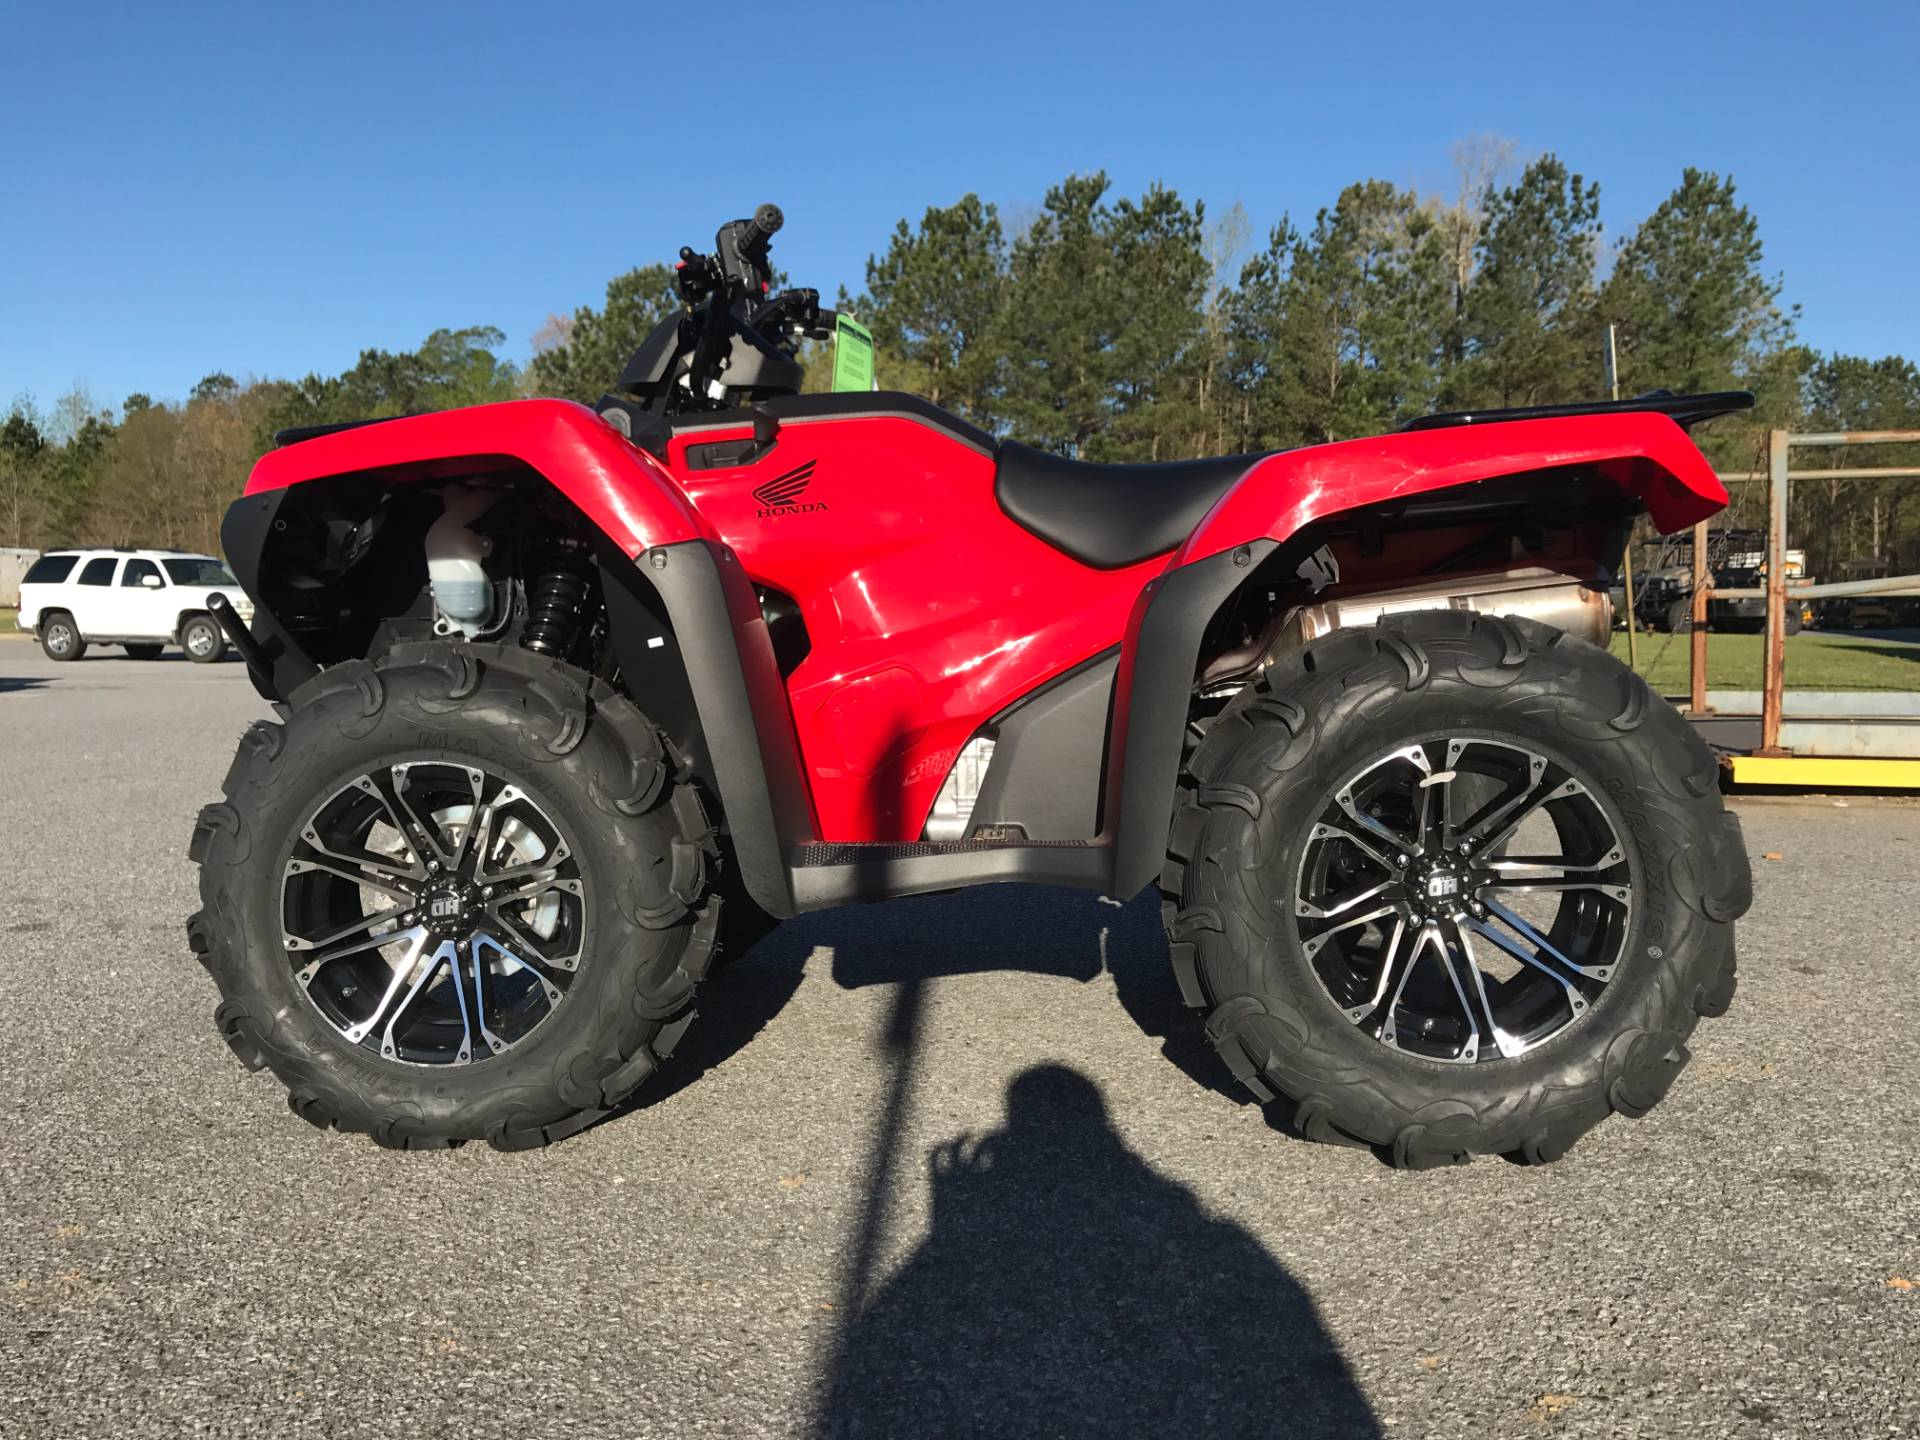 New 2017 Honda FourTrax Rancher 4x4 ES ATVs in Greenville NC